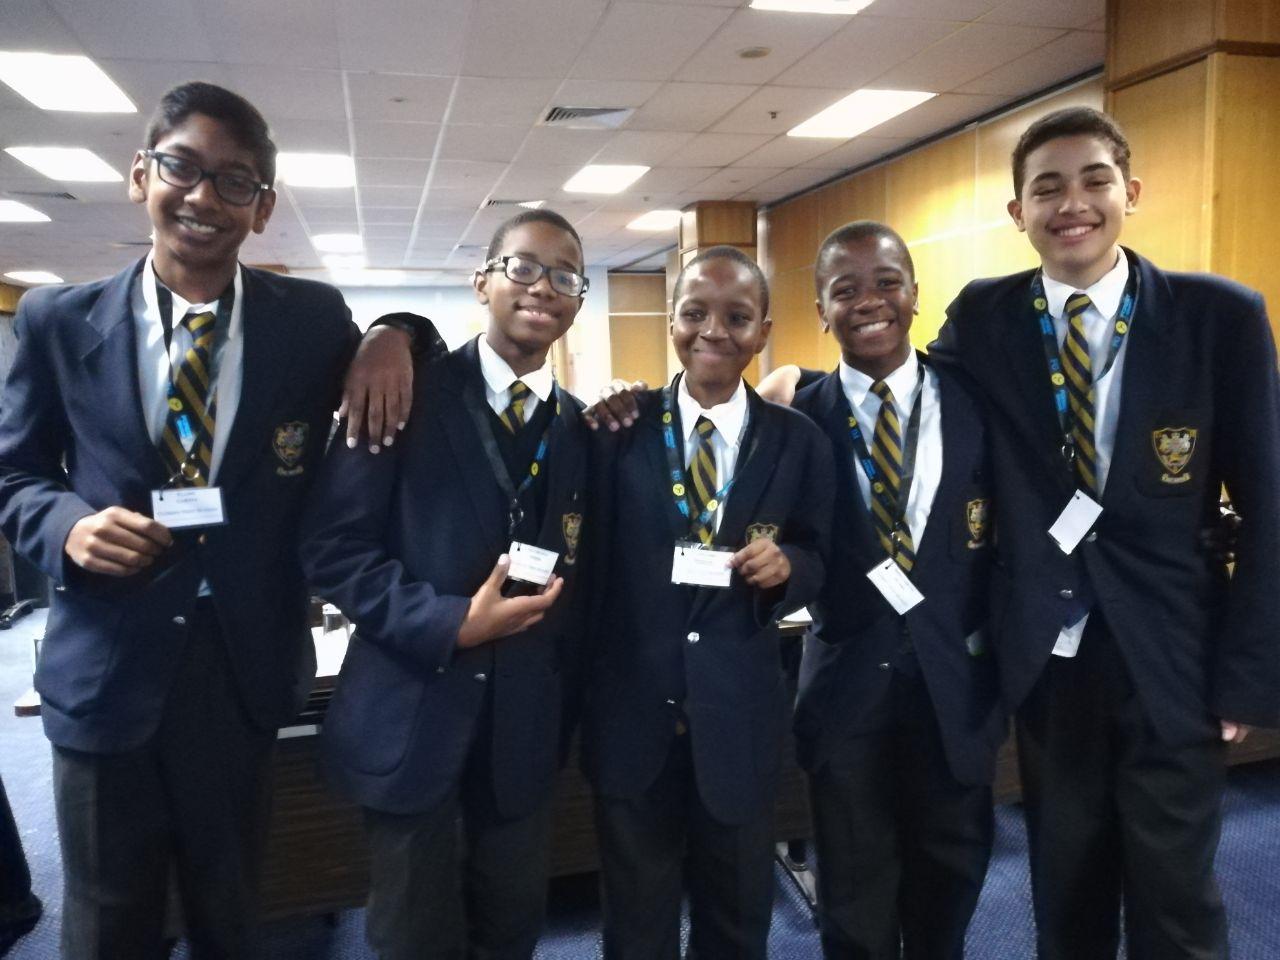 Elijah Chetty, Lindo Myeni, Vuthlhari Mabasa, Sabelo Mlaba and Ethan Cloete